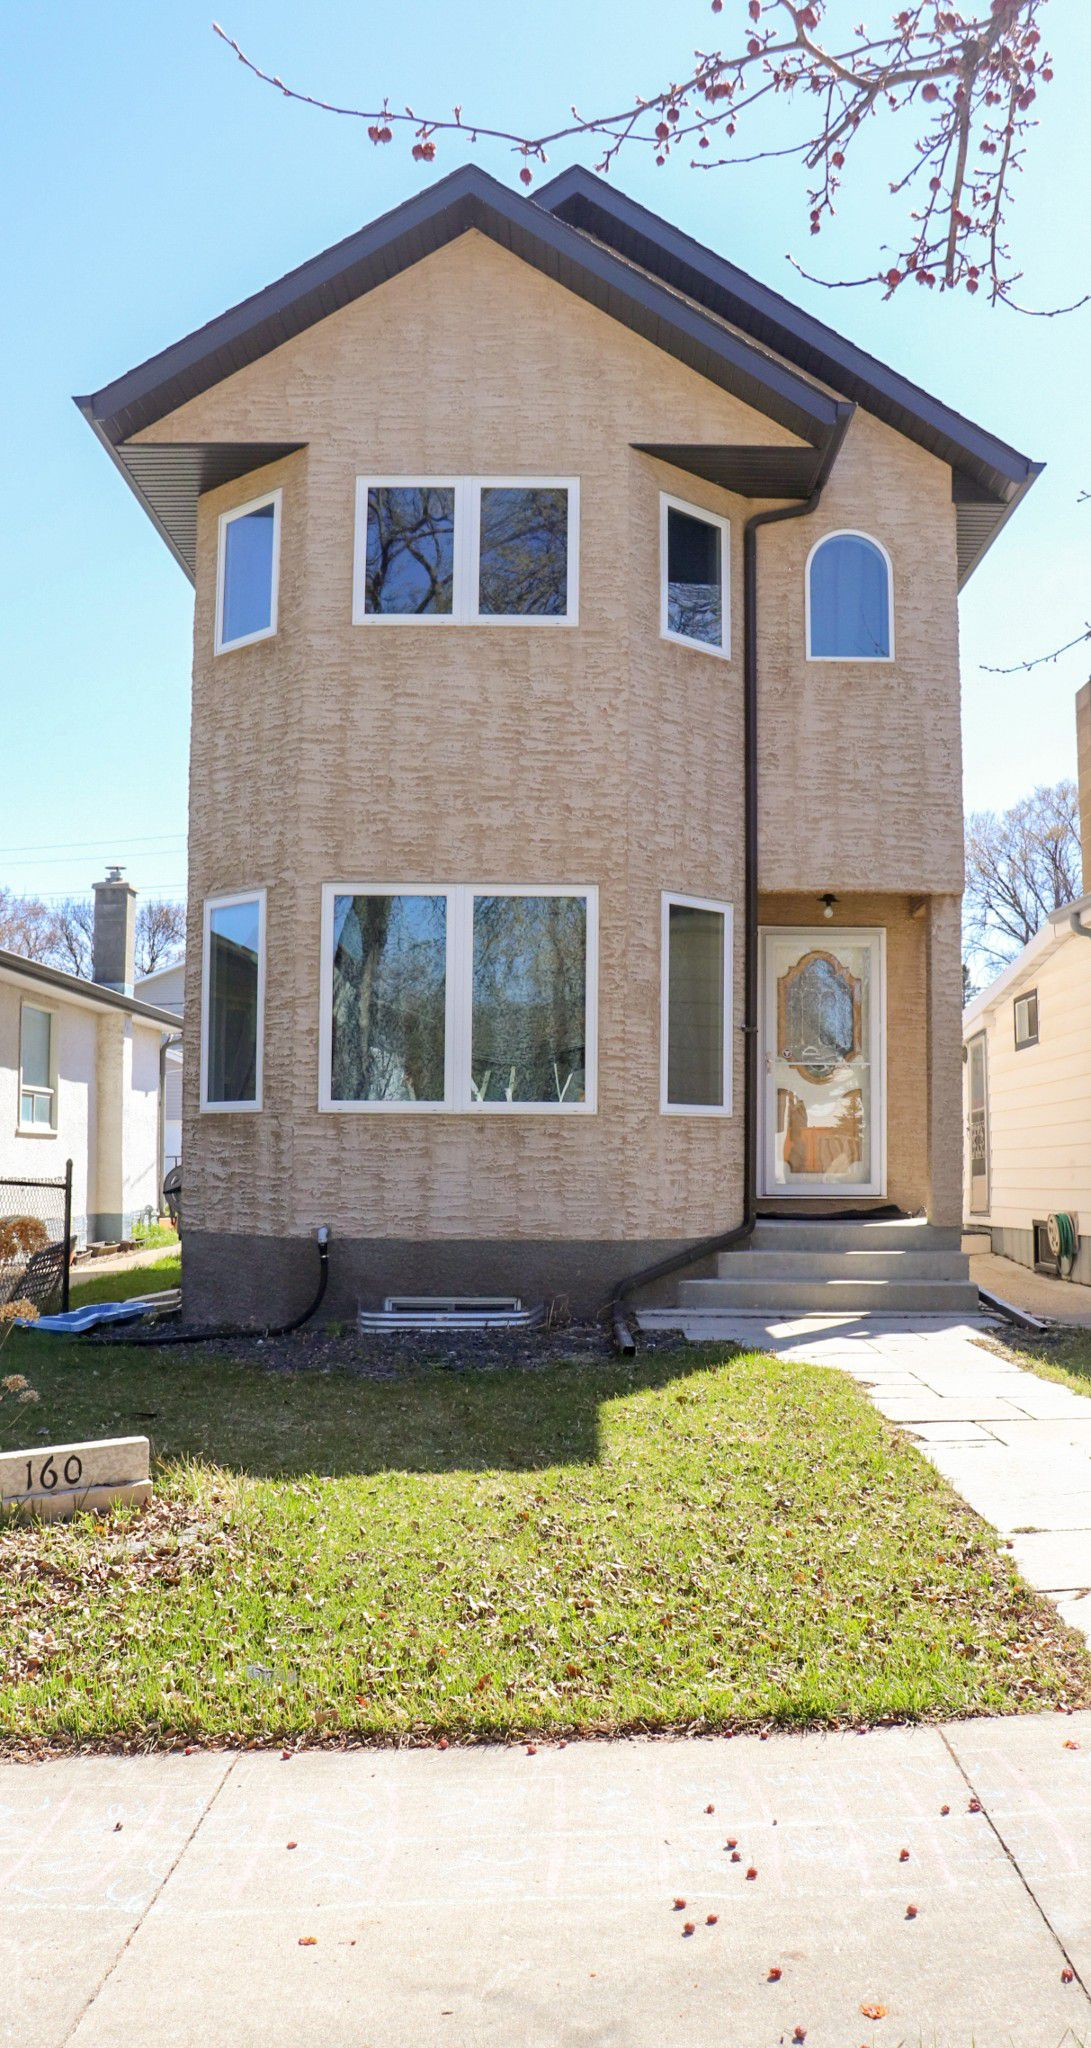 Main Photo: 160 Burrin Avenue in Winnipeg: Single Family Detached for sale (4D)  : MLS®# 1911971